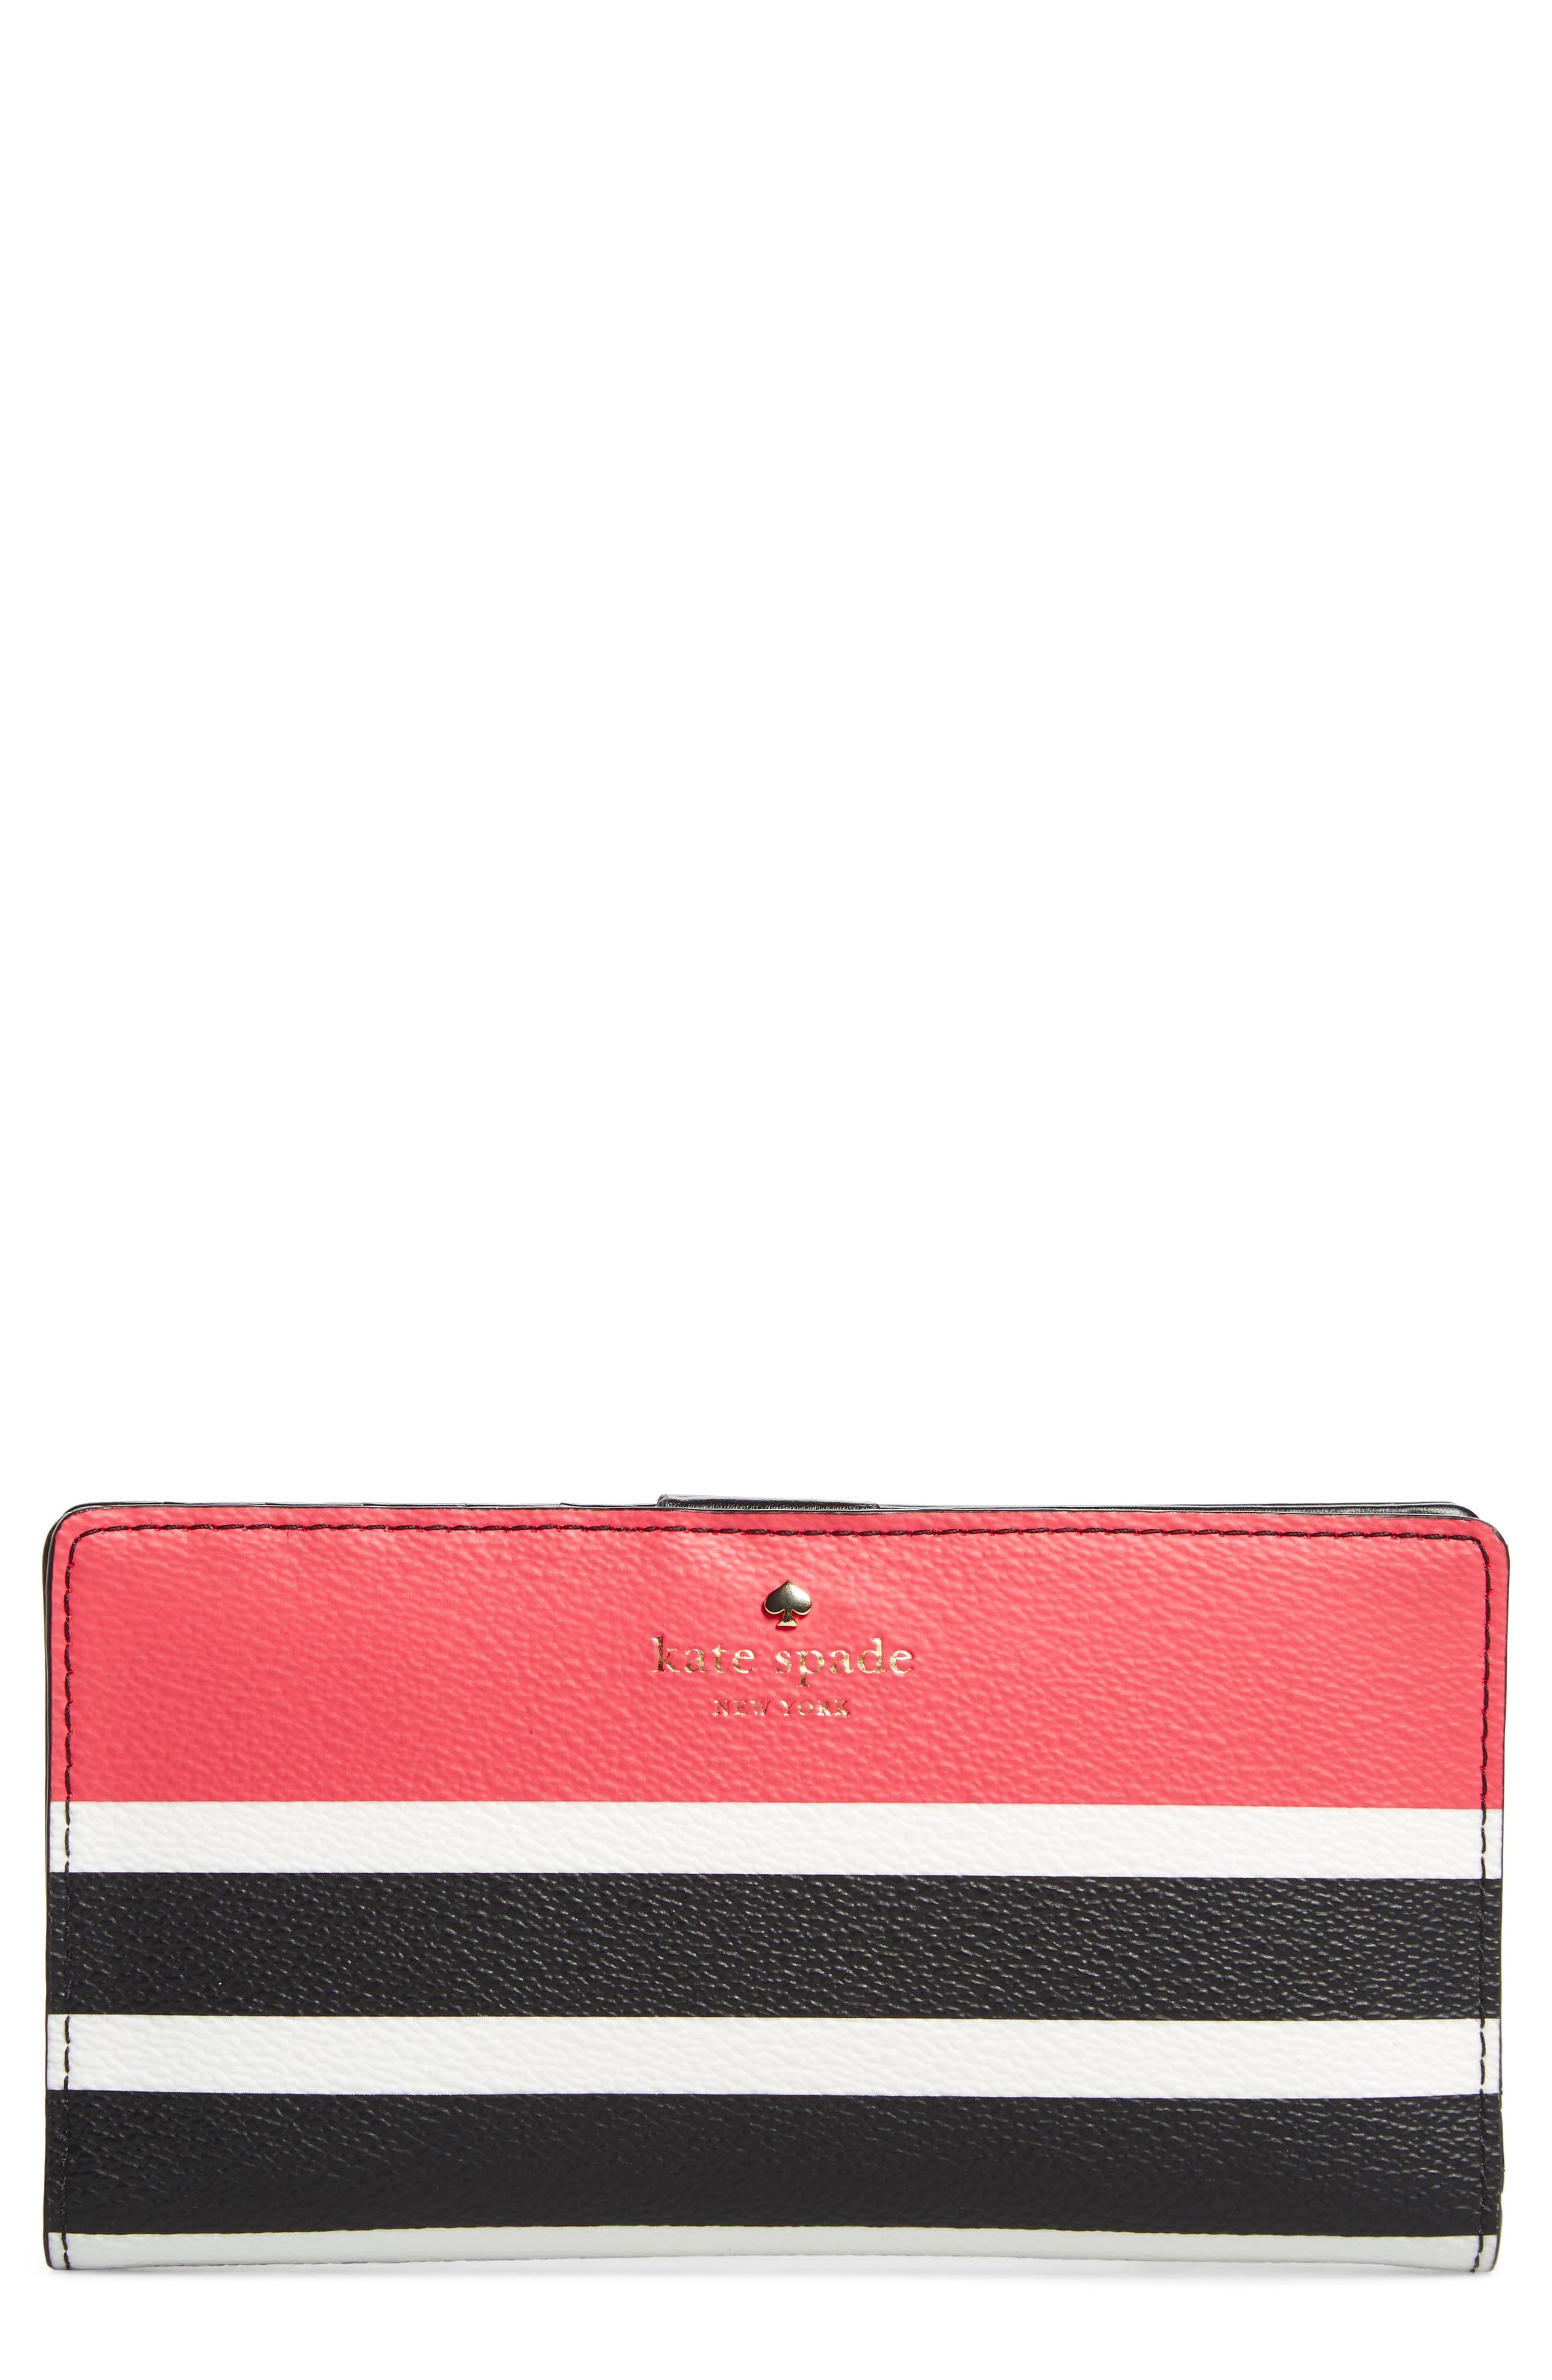 hyde lane - stripe faux leather stacy wallet,                             Main thumbnail 1, color,                             001